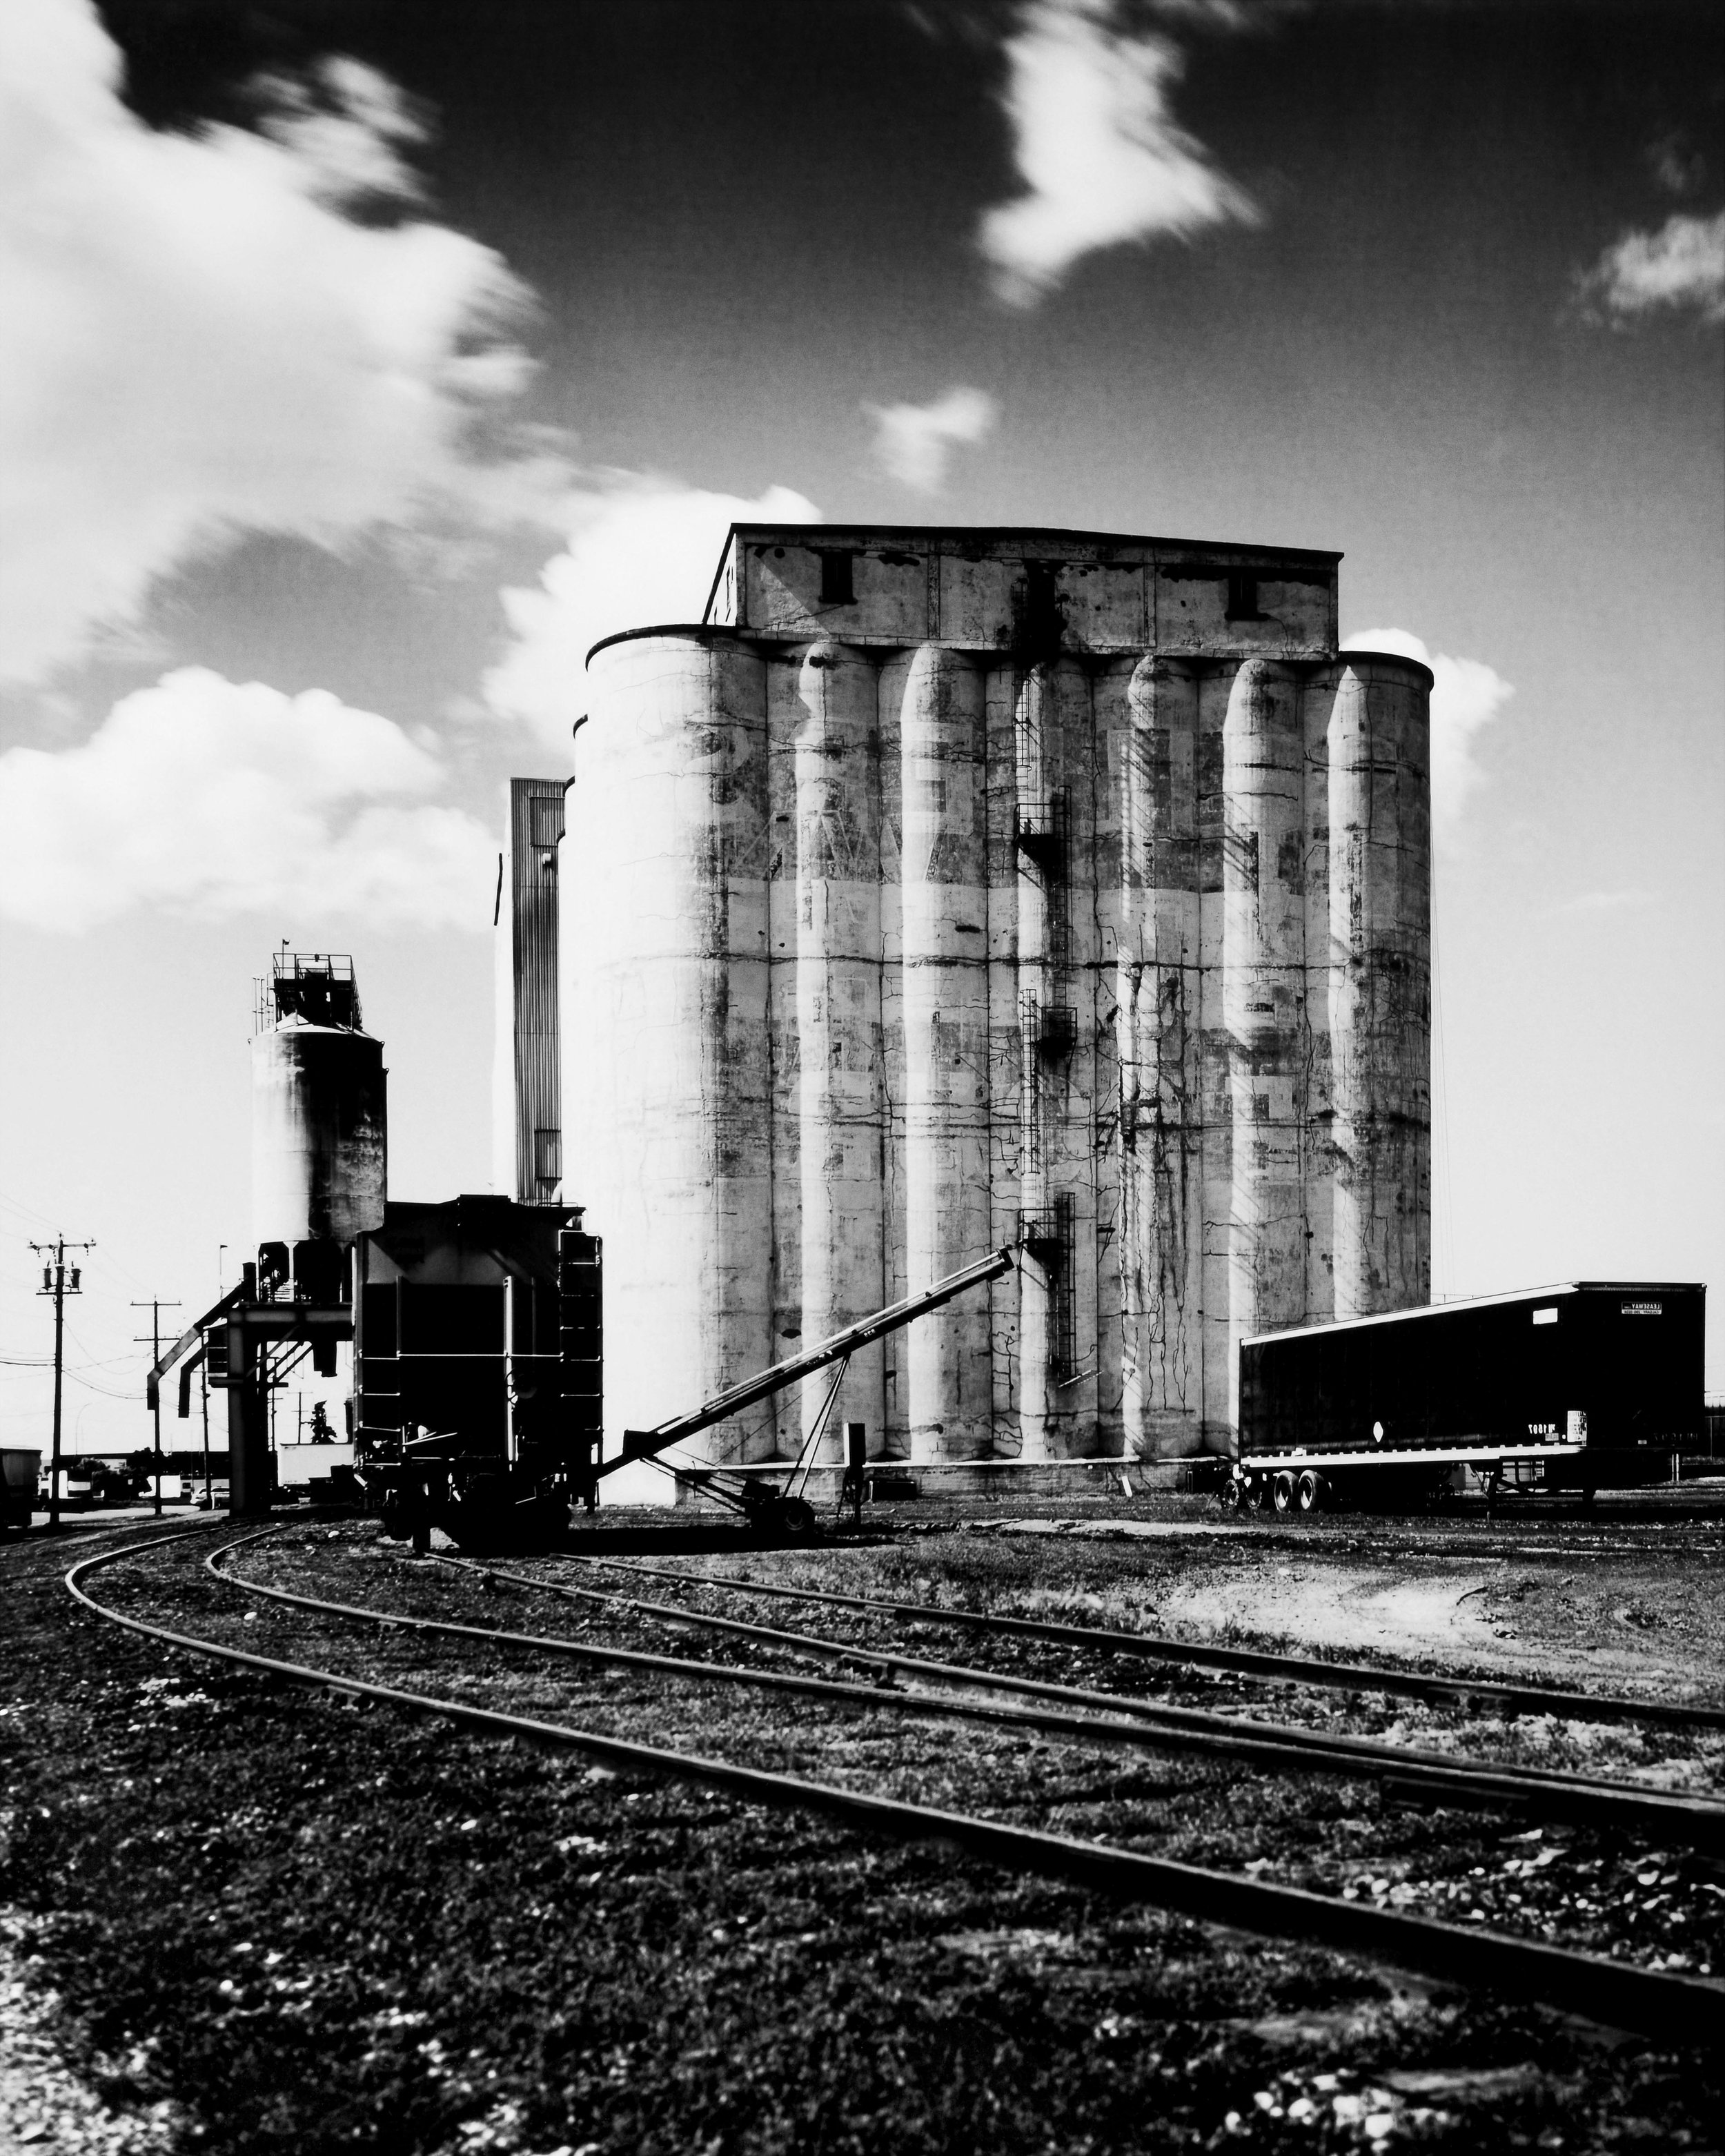 Reproduction - Grain Tracks - Print - No Border.jpg